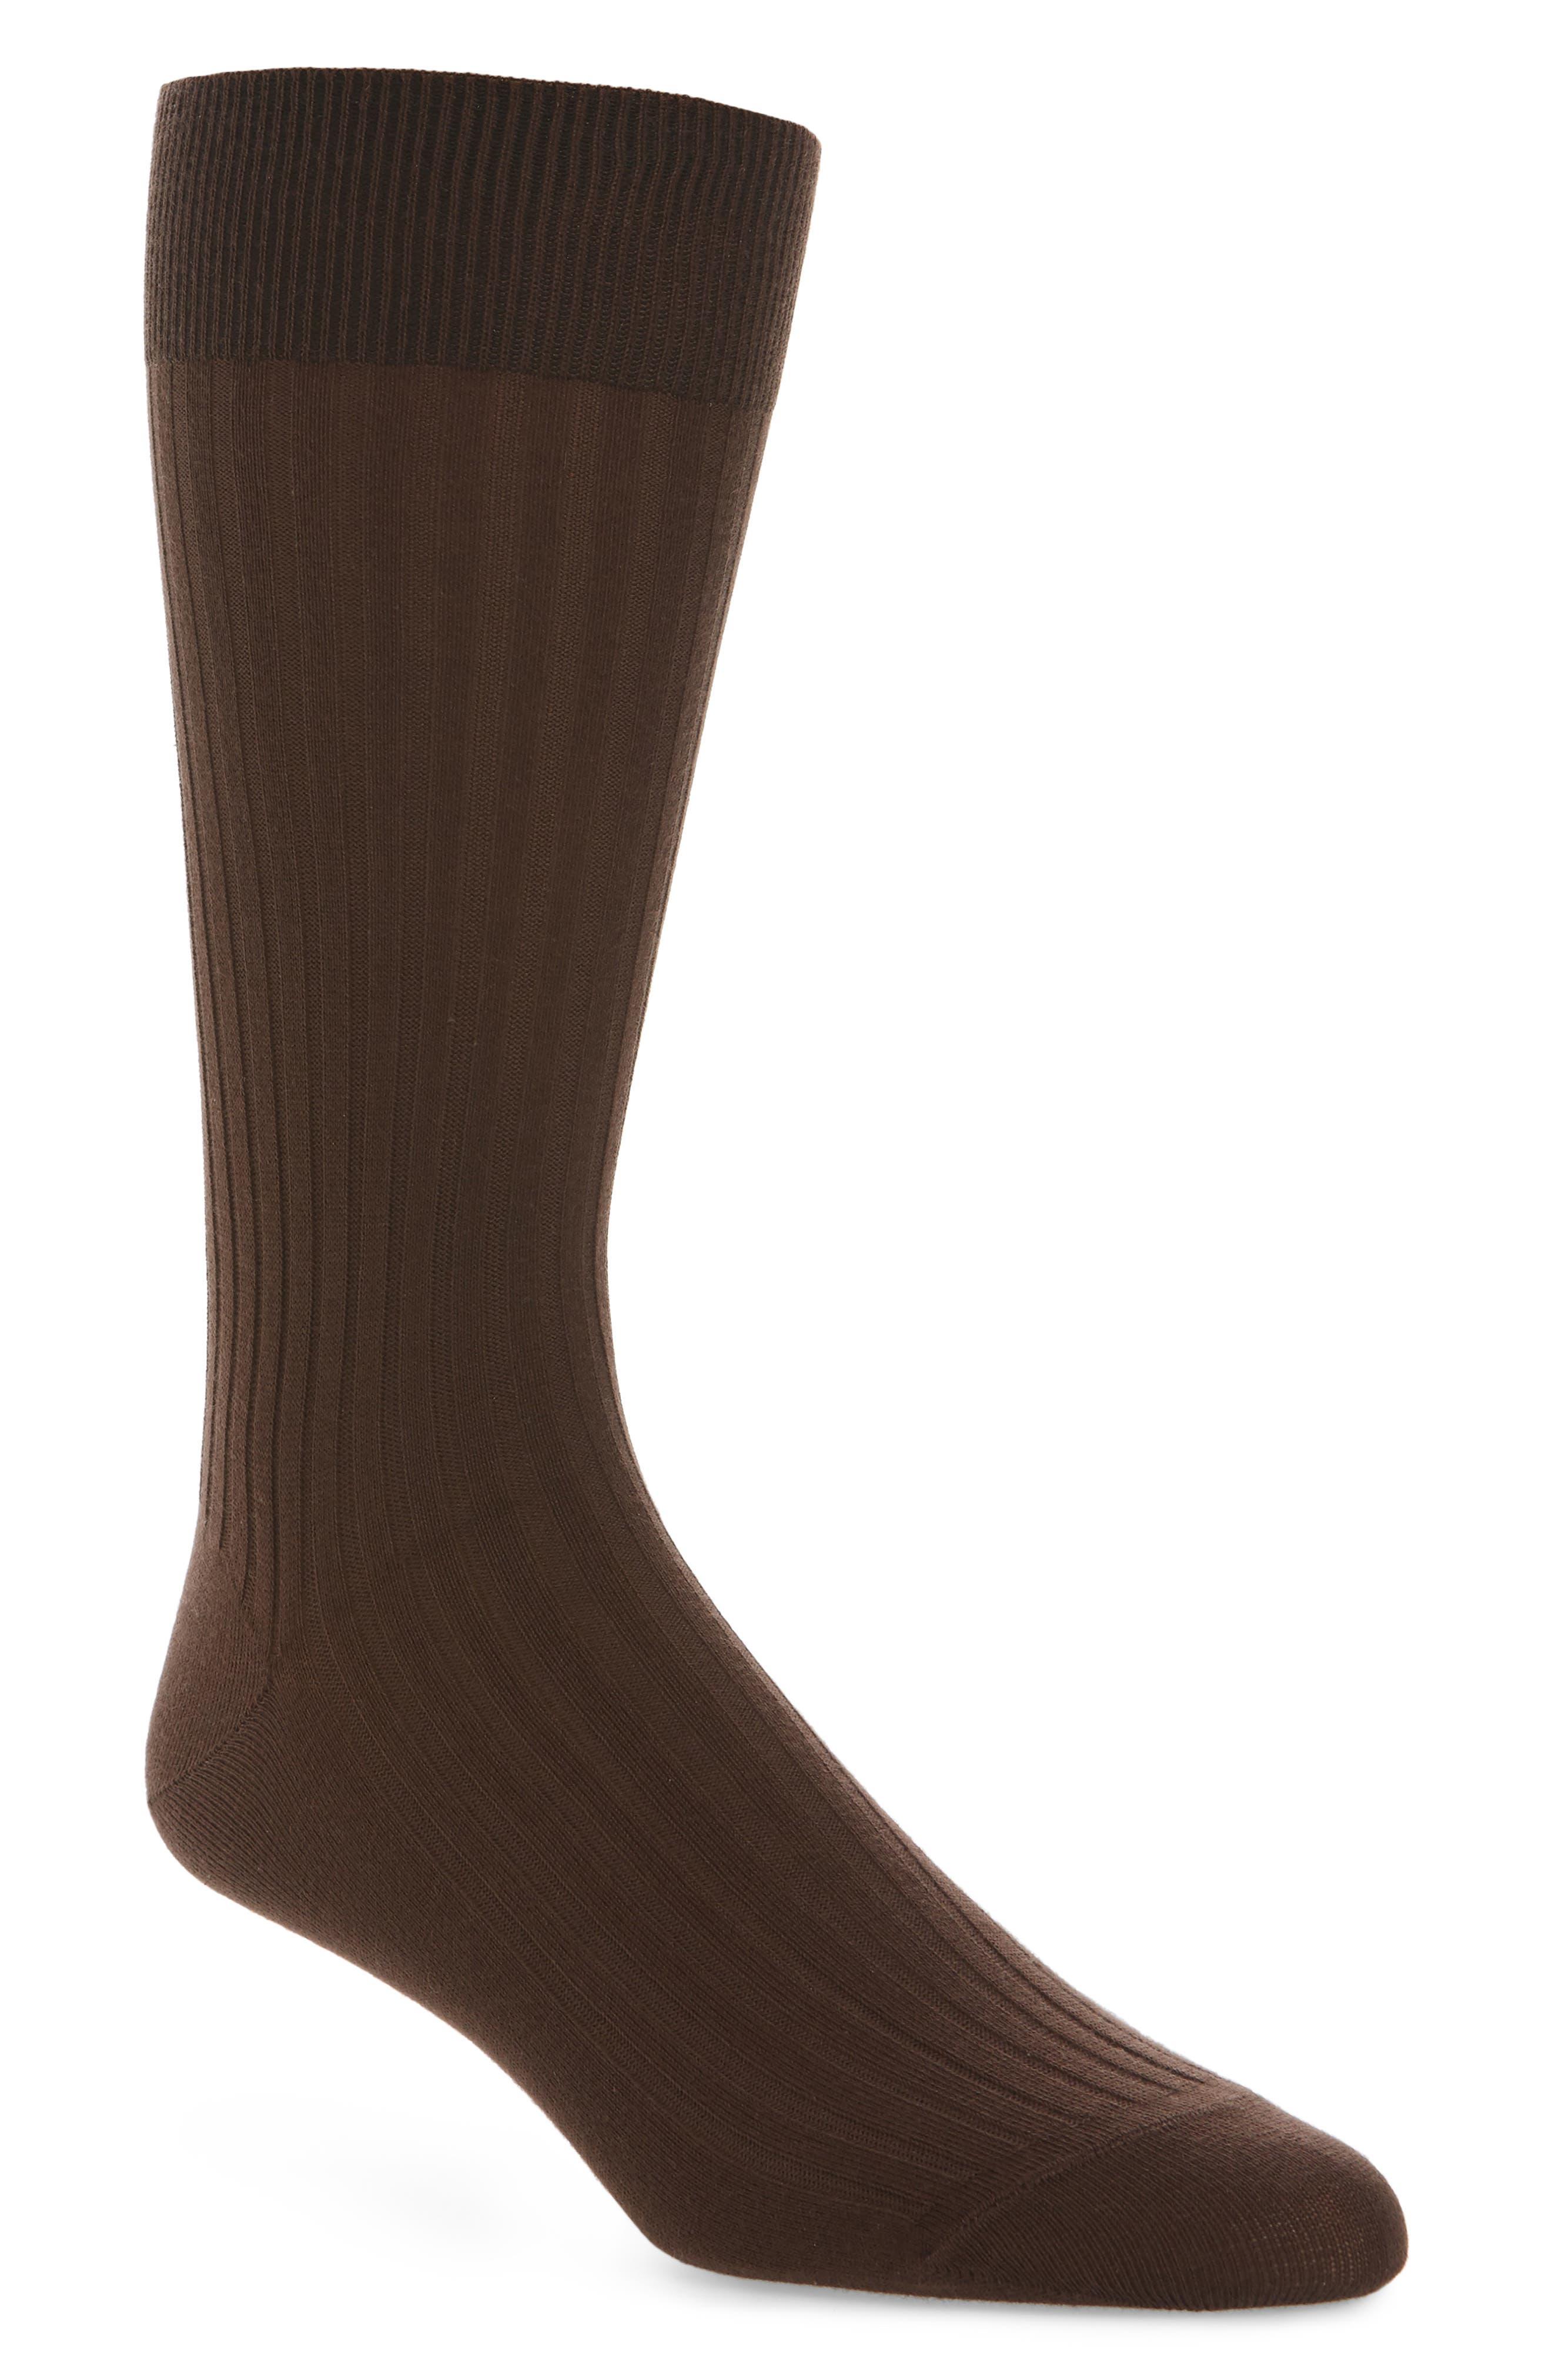 Alternate Image 1 Selected - John W. Nordstrom® Ribbed Pima Cotton Crew Socks